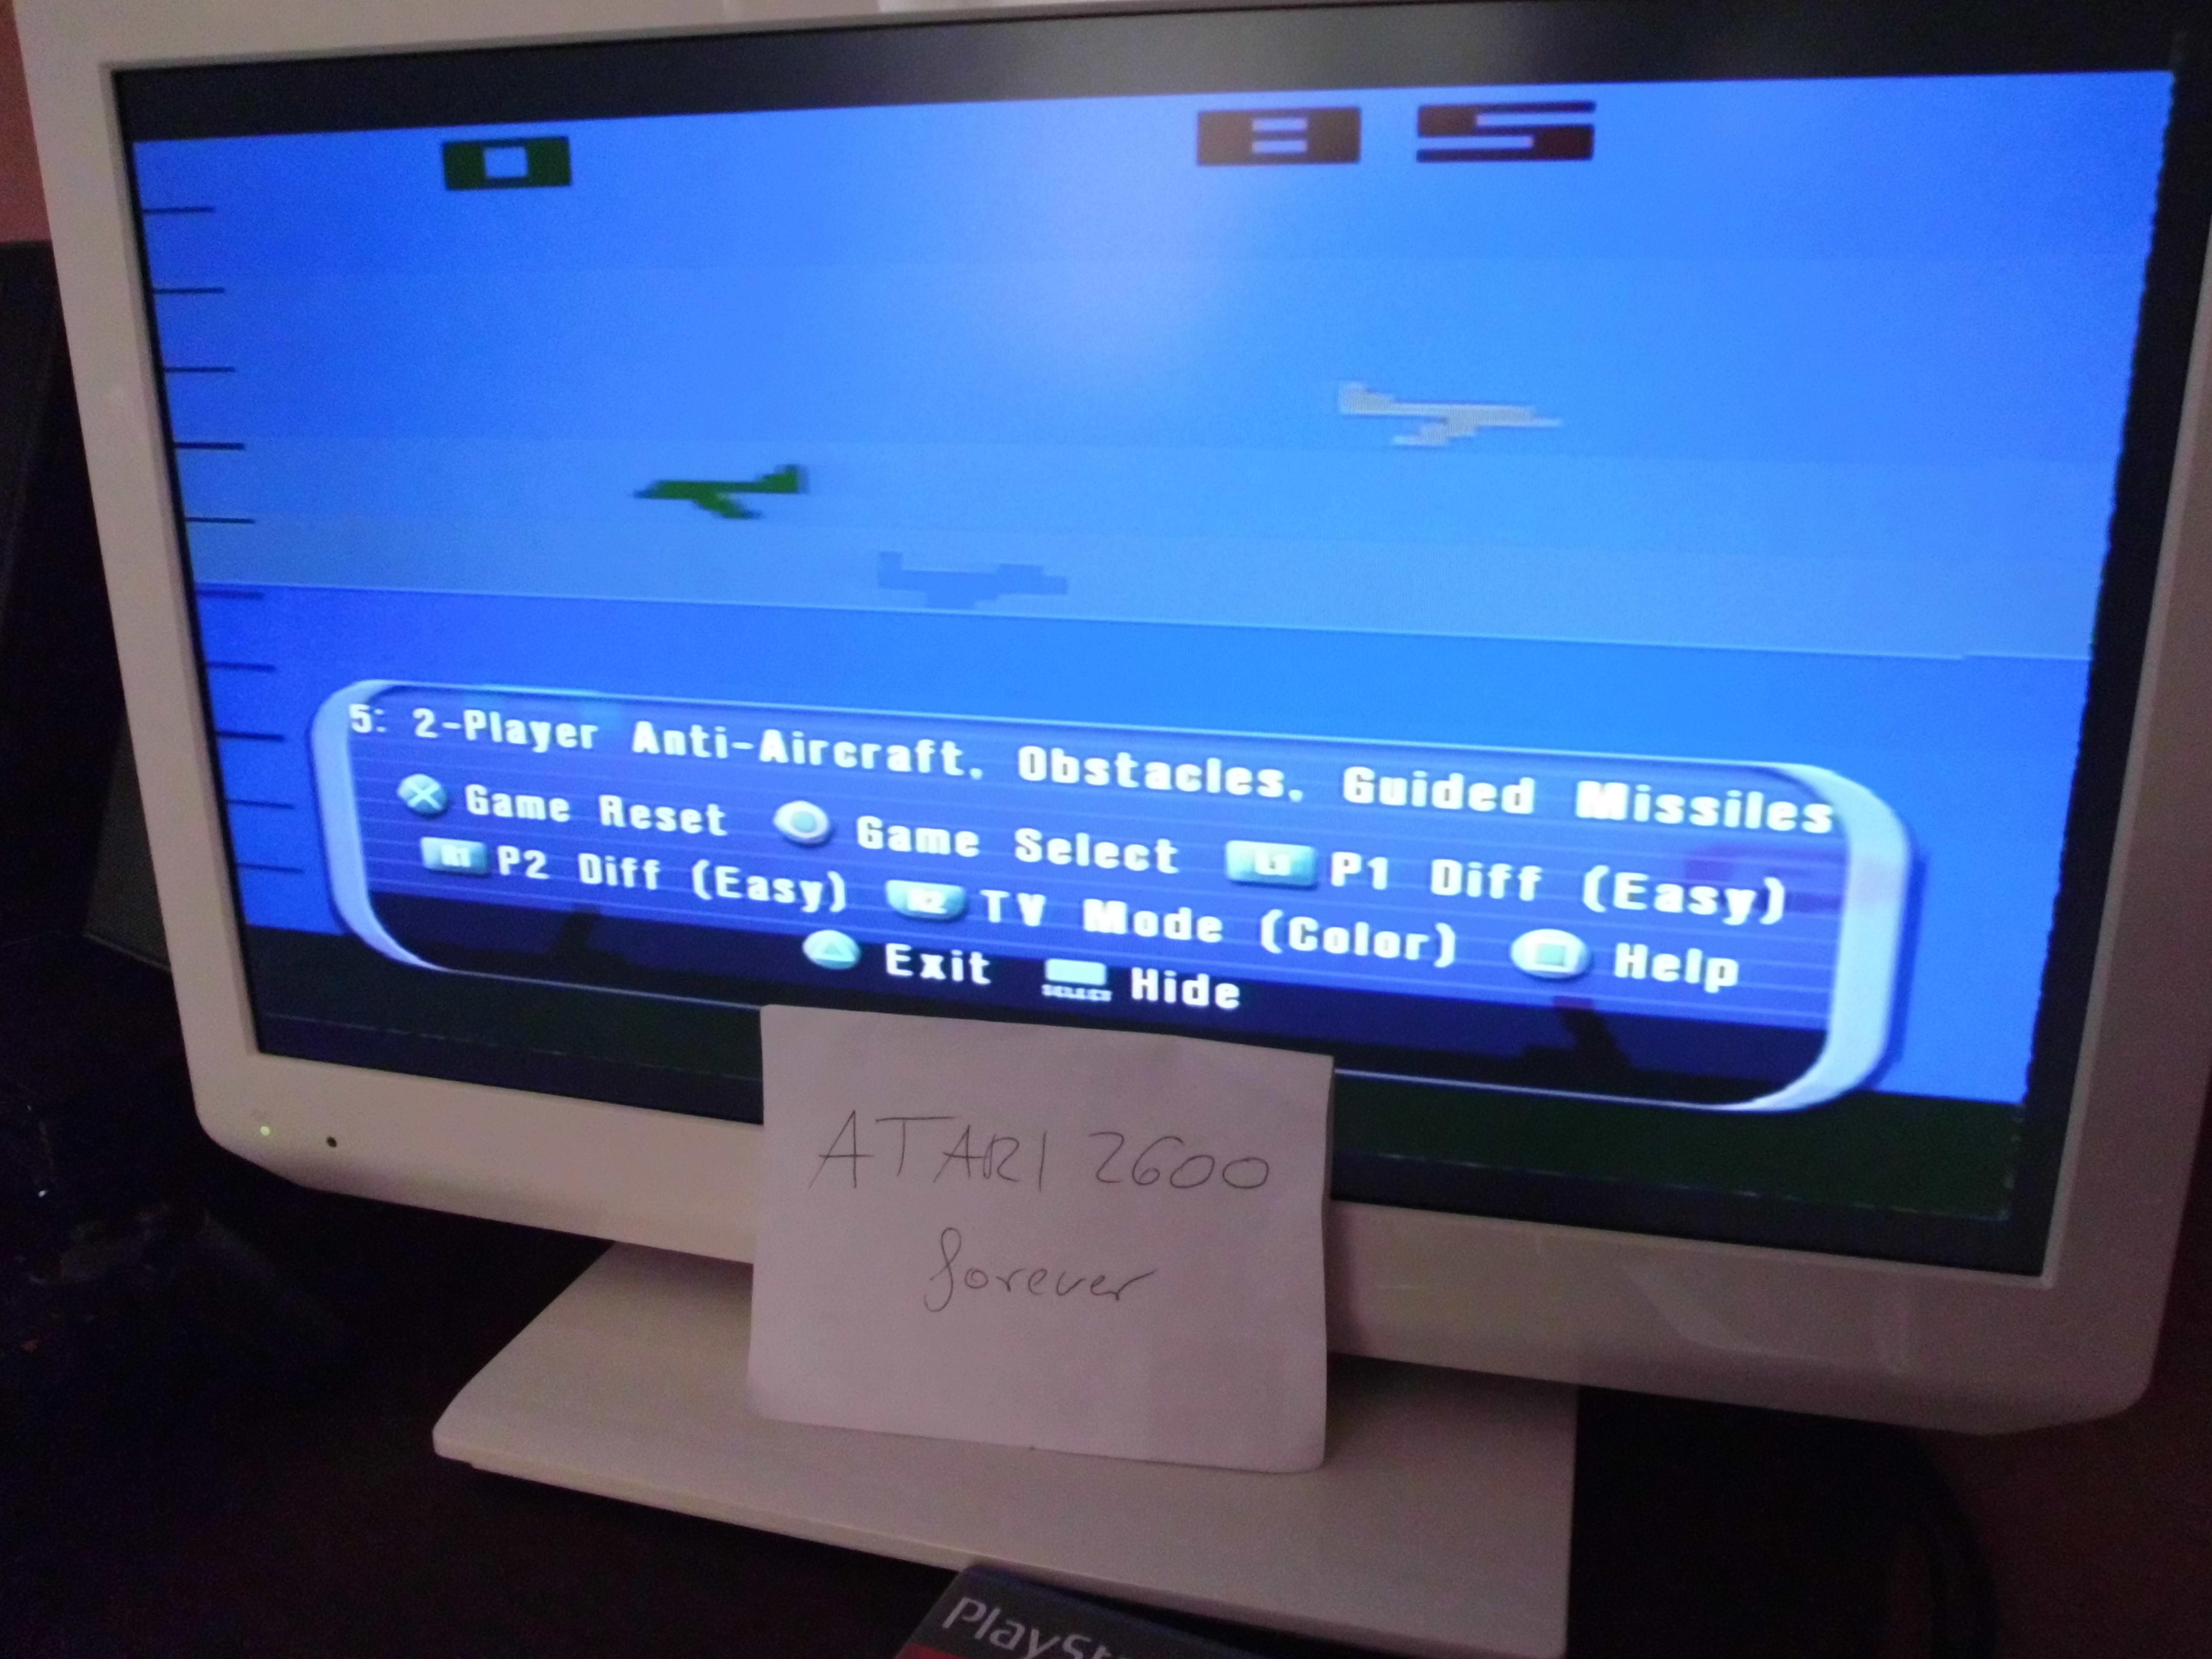 atari2600forever: Atari Anthology: Air-Sea Battle [Game 5B] (Playstation 2) 85 points on 2018-03-29 03:46:00